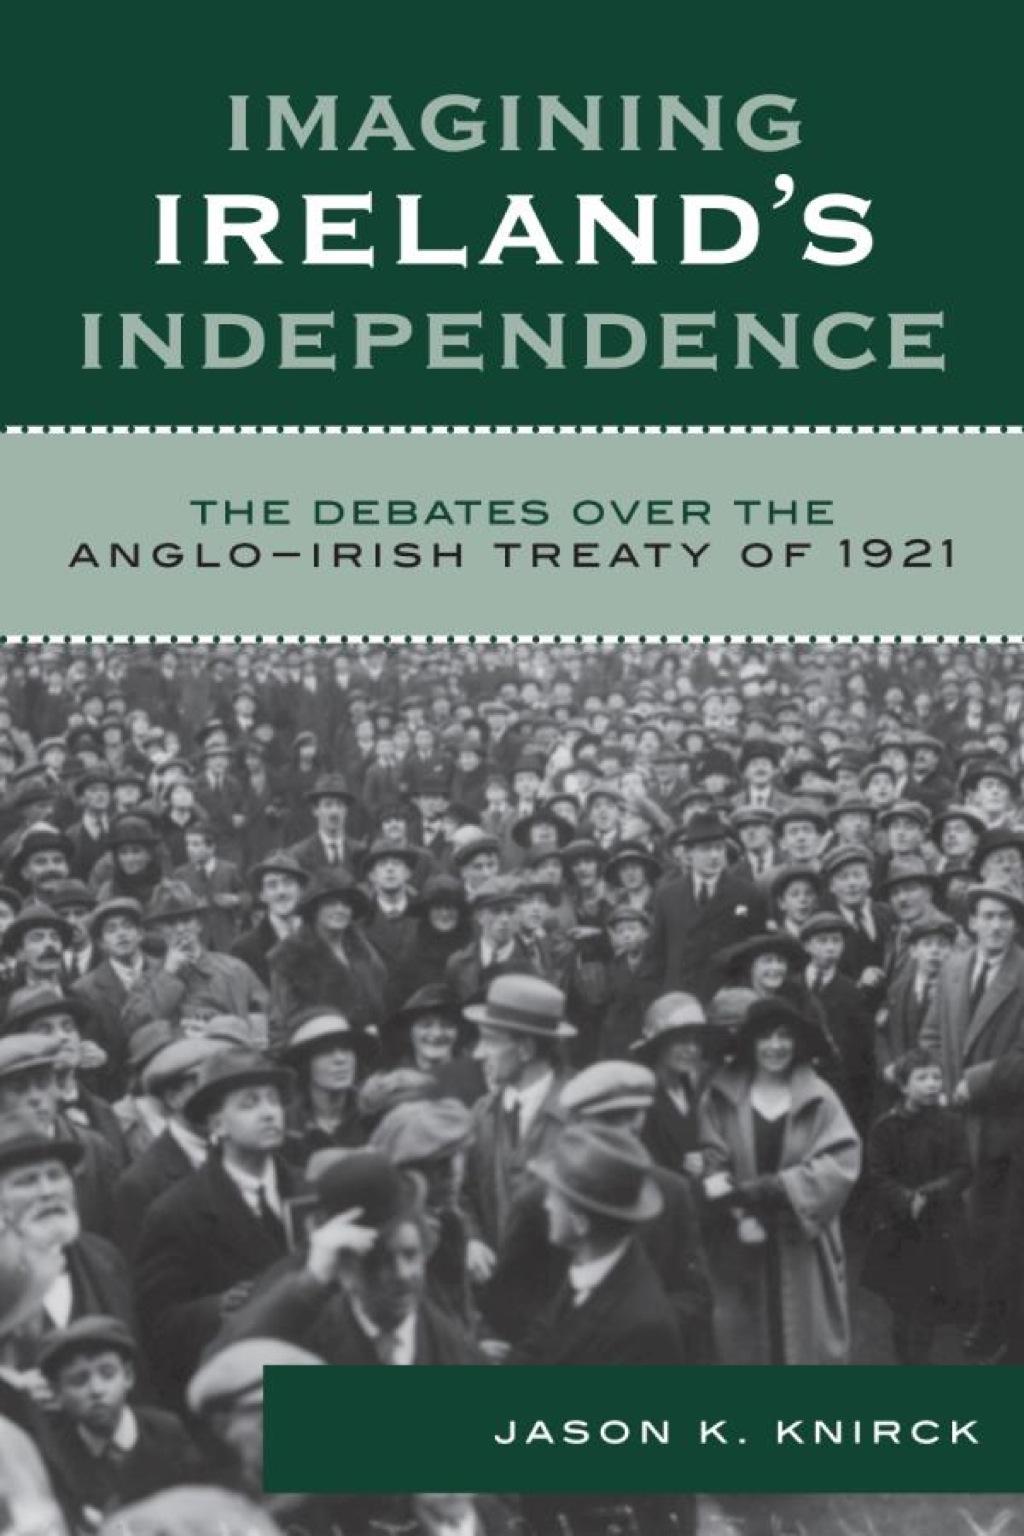 Imagining Ireland's Independence (ebook)